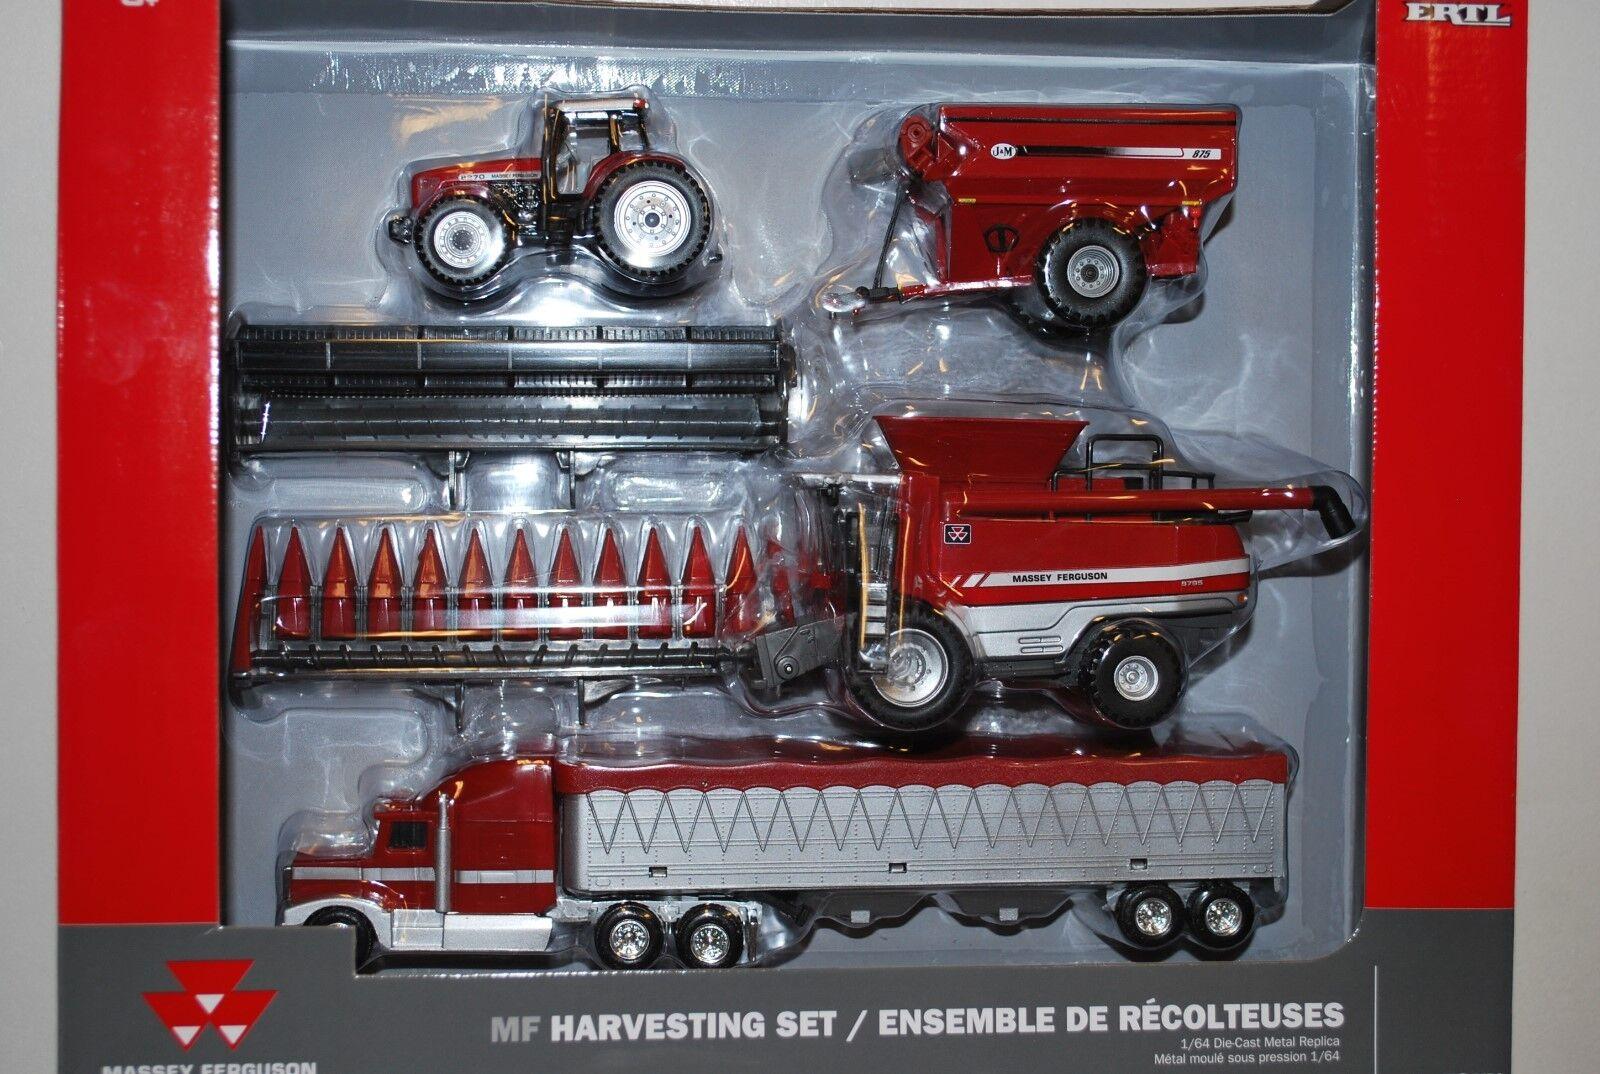 ¡Nuevo! 1/64 Massey Ferguson Cosecha Set 9795 Combina,8270 Tractor & Grano